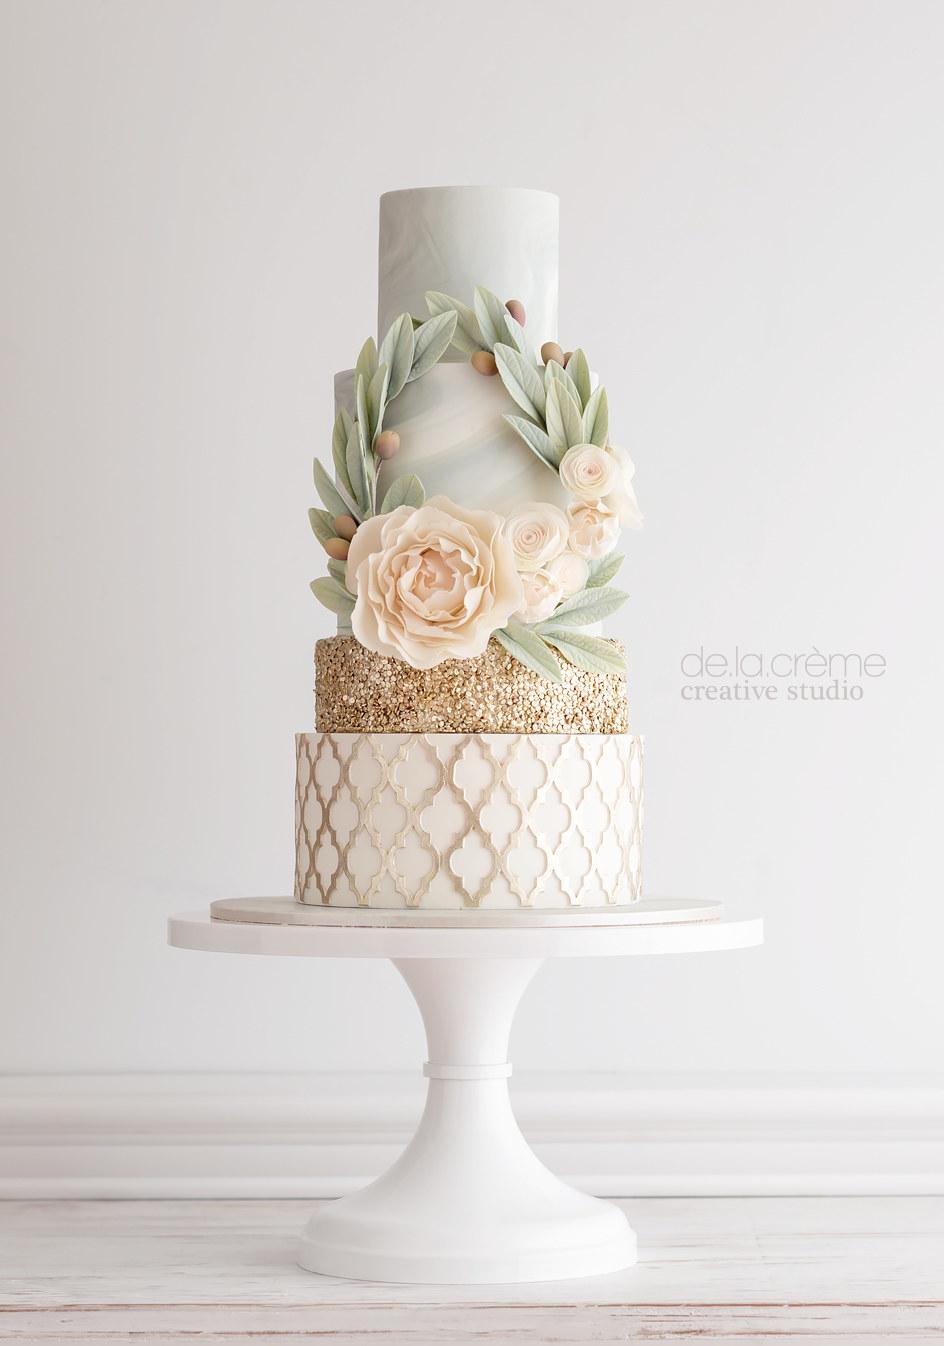 bolo-casamento-guirlanda-flores-03 b